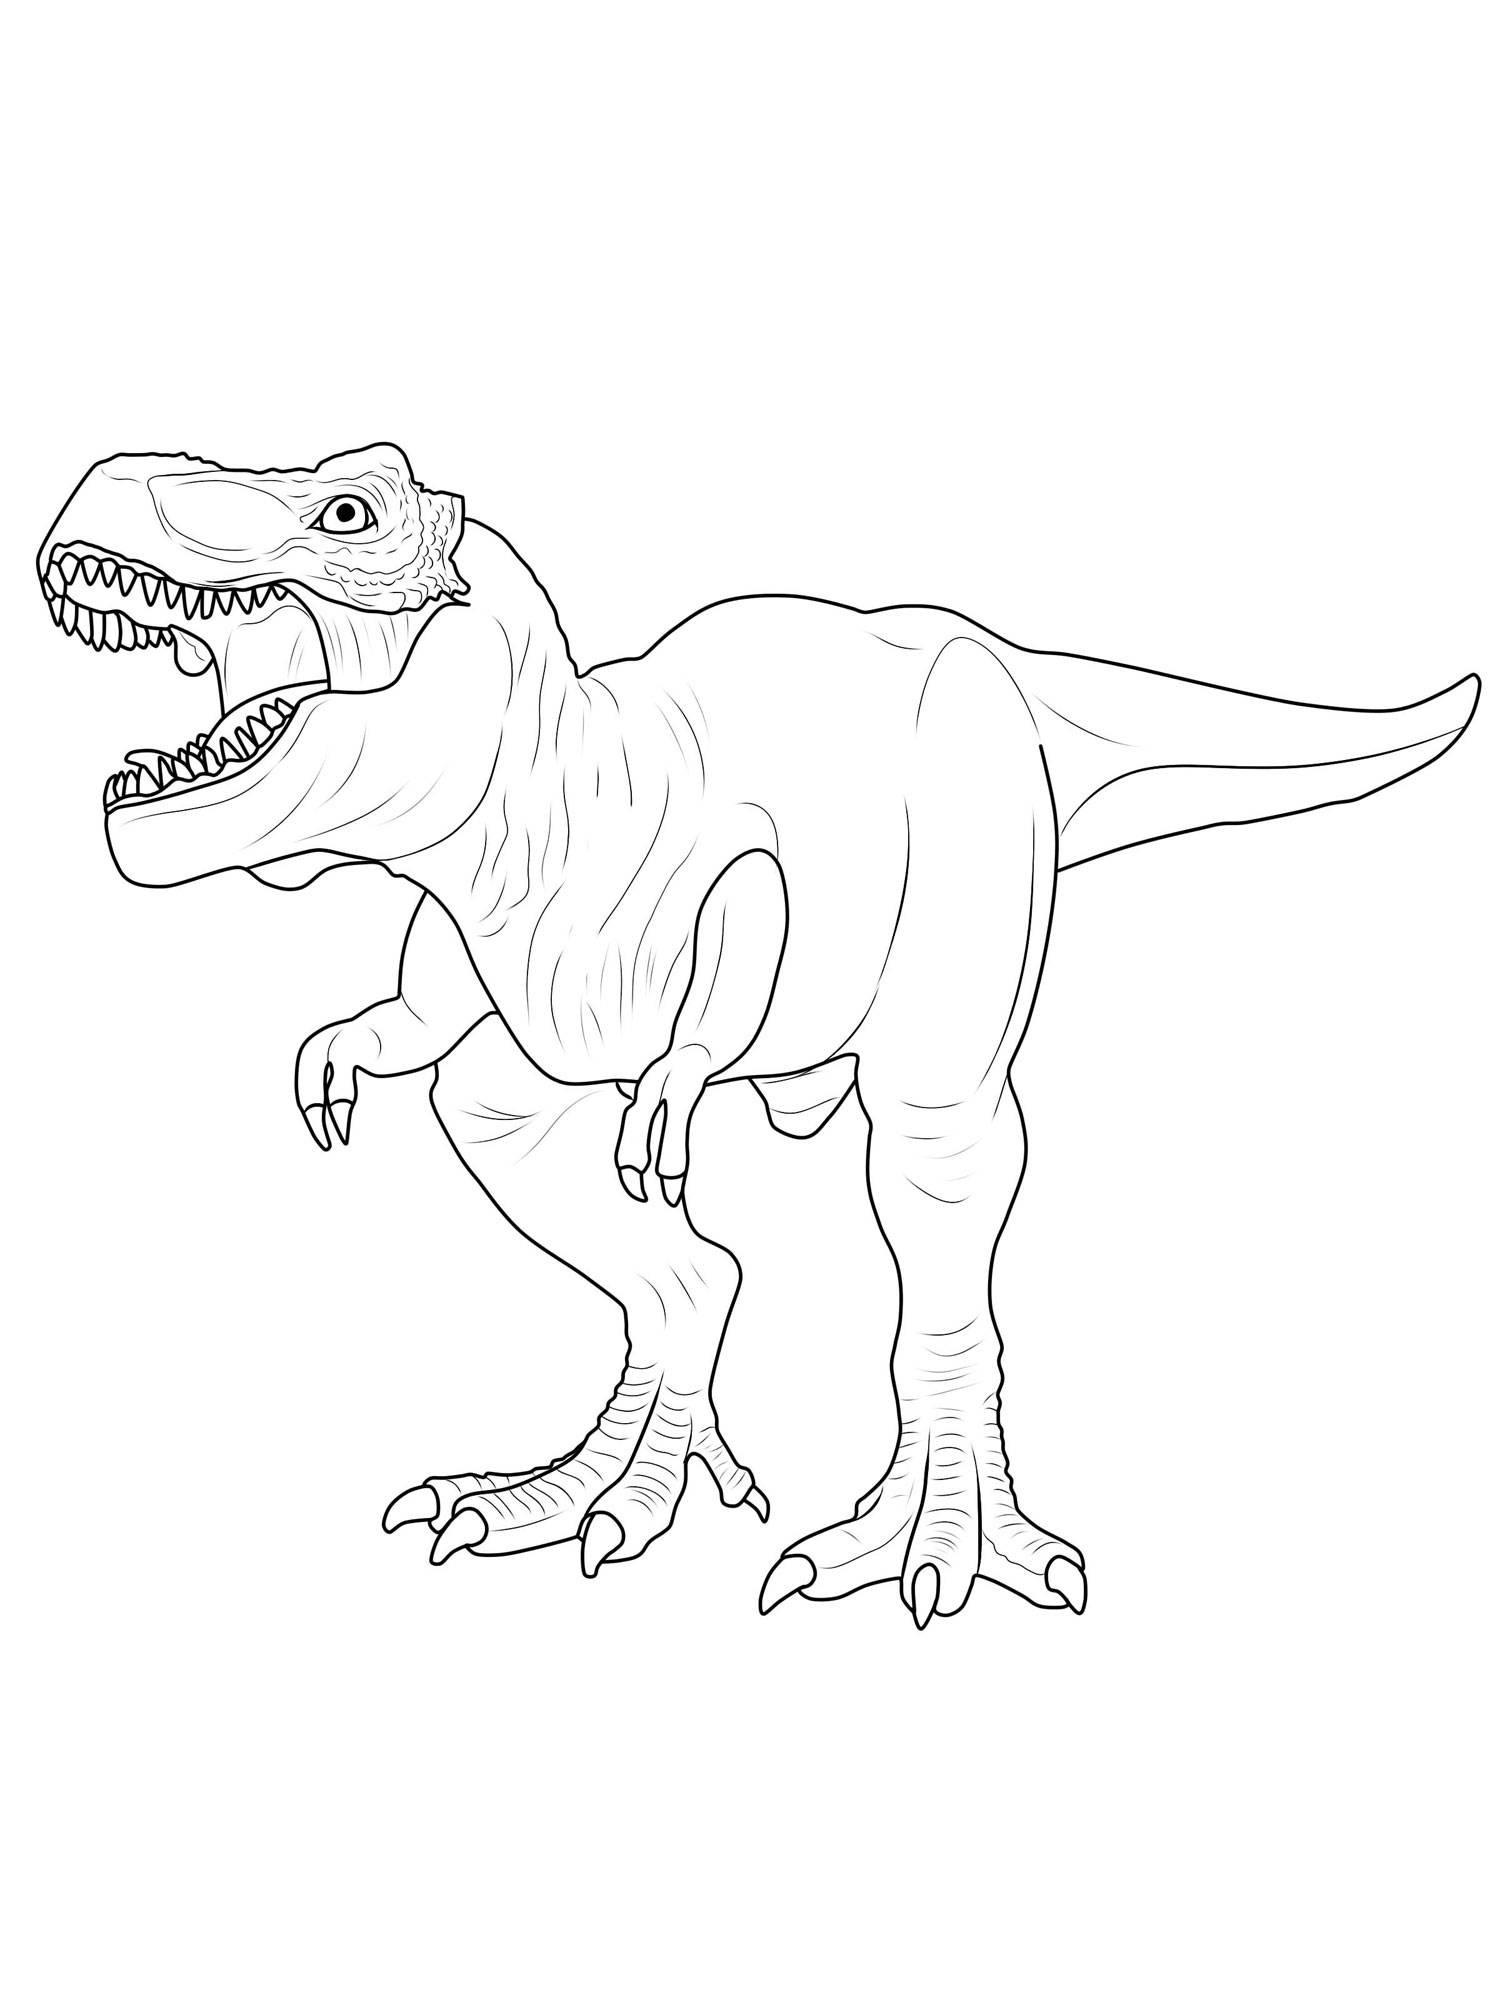 Dinosaurier Ausmalbilder Tyrannosaurus Rex Neu Tyrannosaurus Rex Bilder Zum Ausdrucken — Hylenddawards Fotografieren